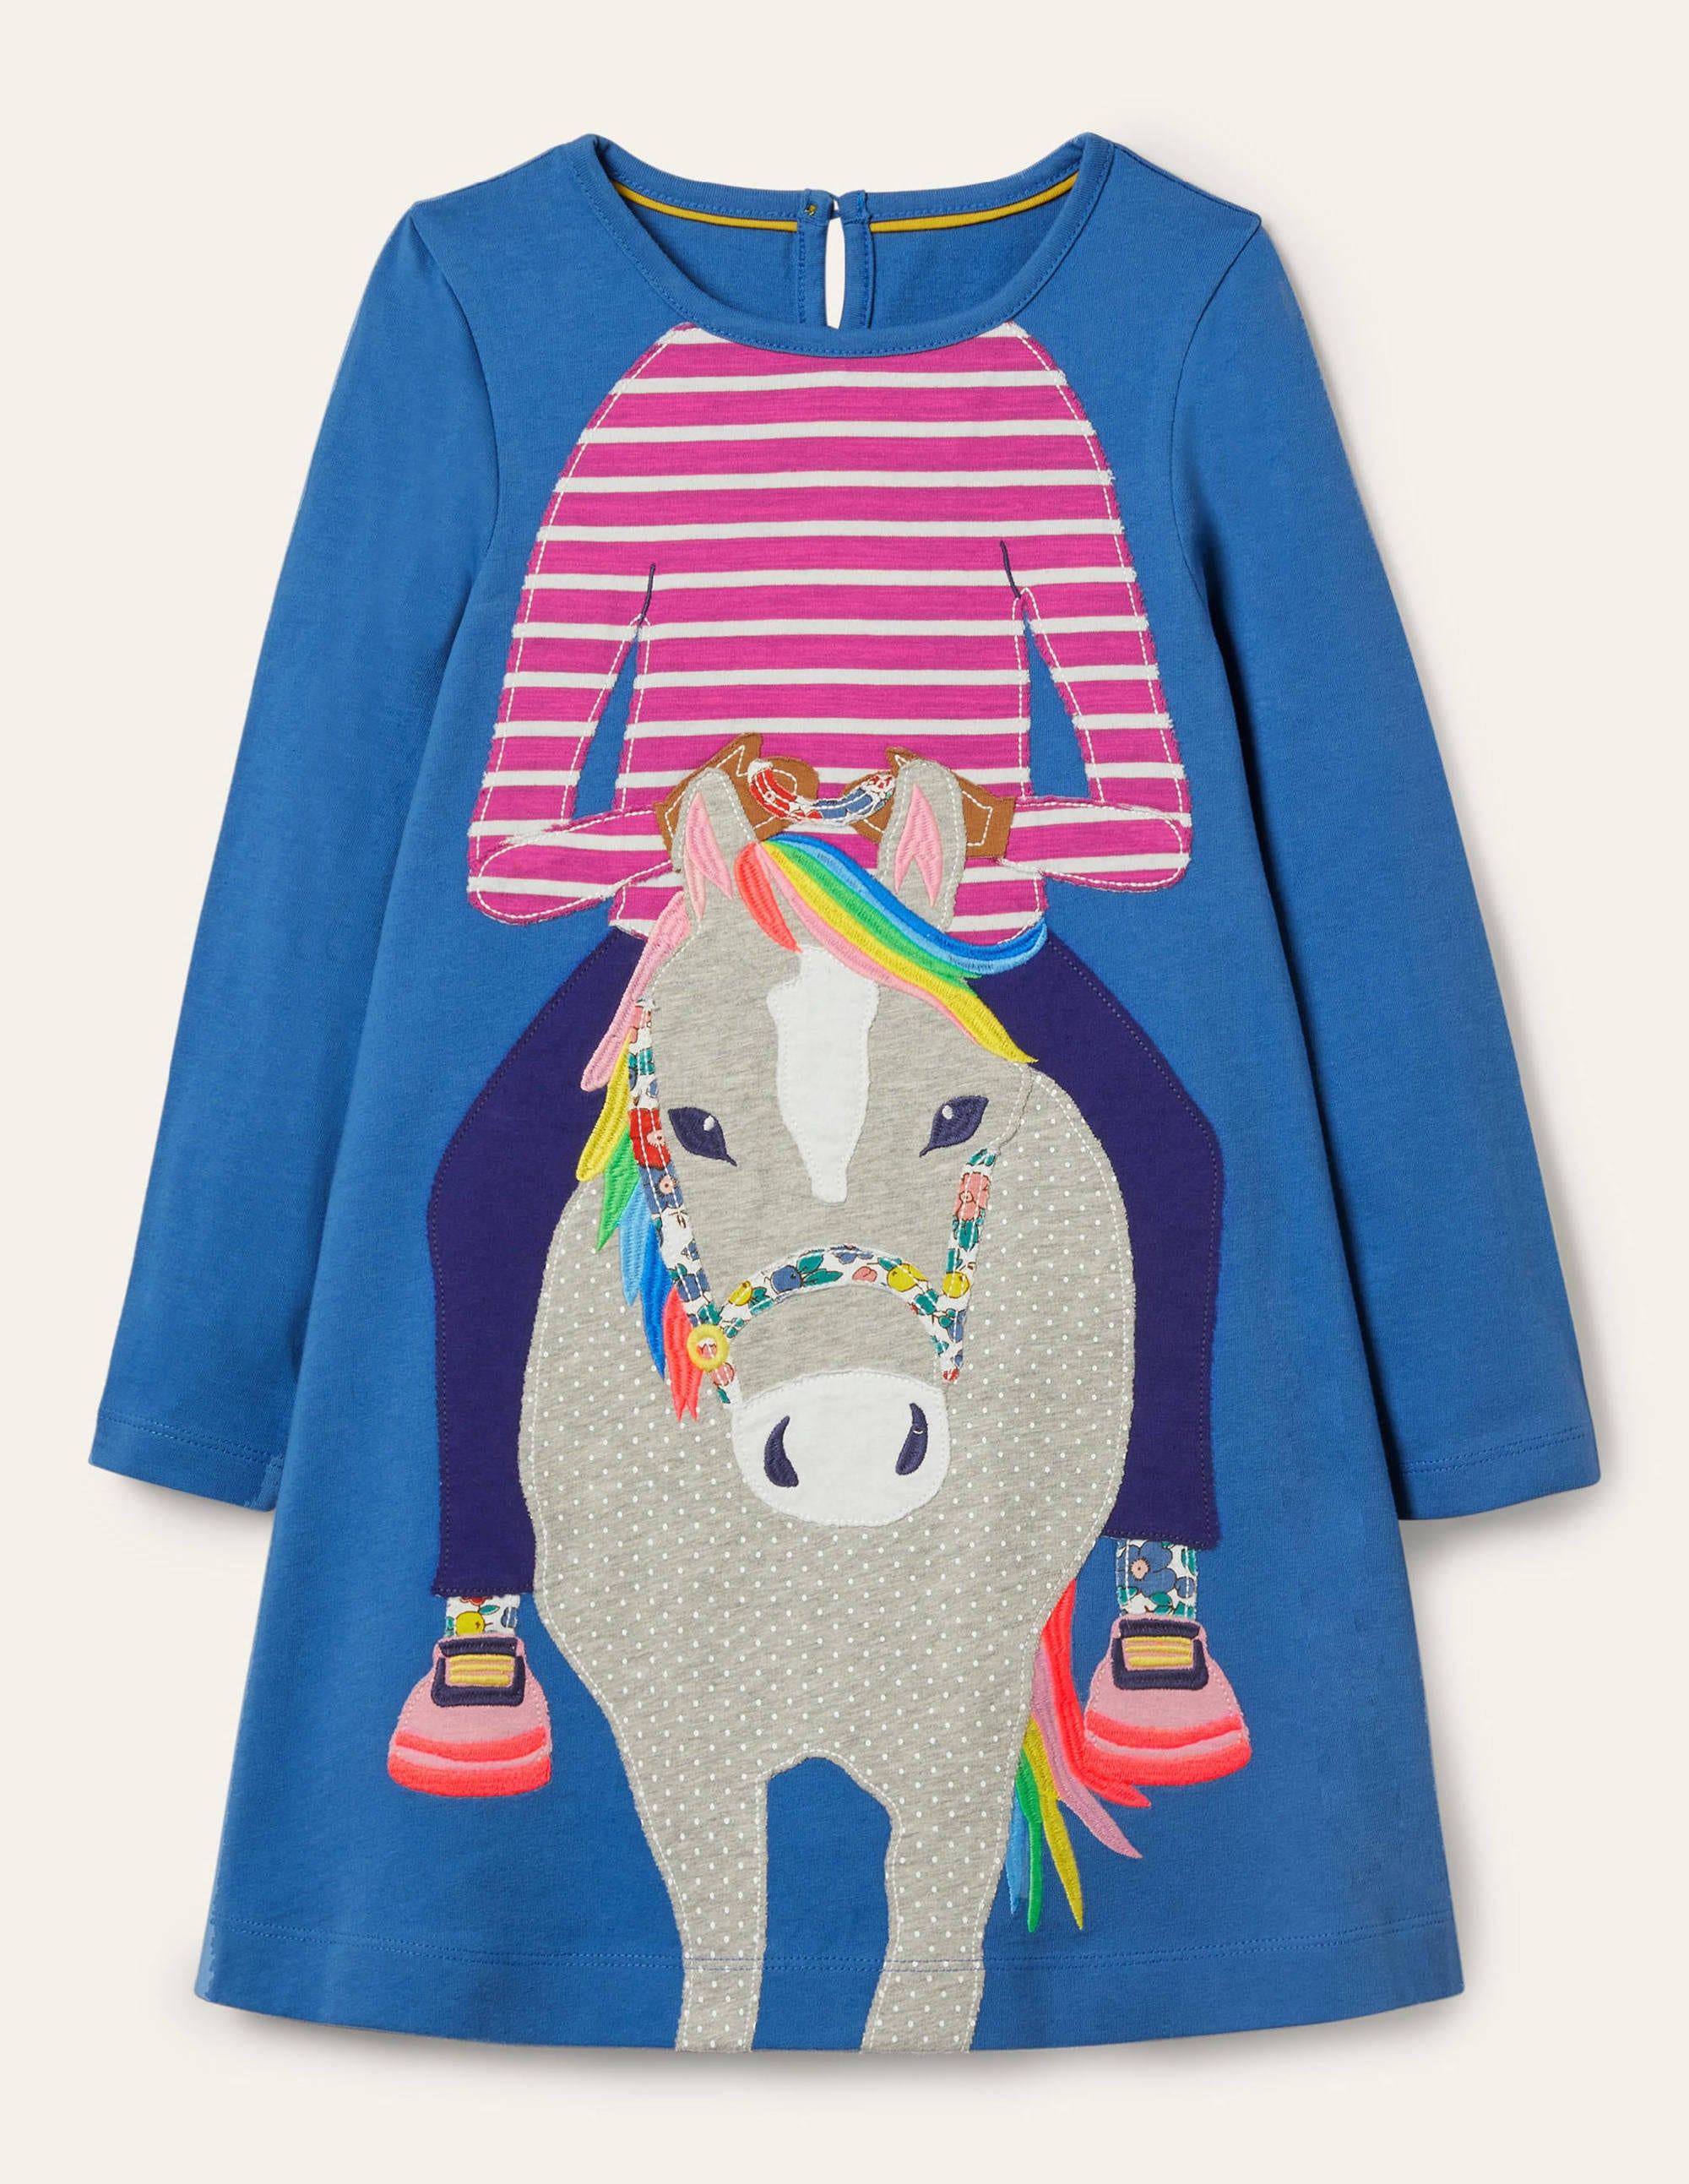 Boden Big Applique Jersey Dress - Elizabethan Blue Horse